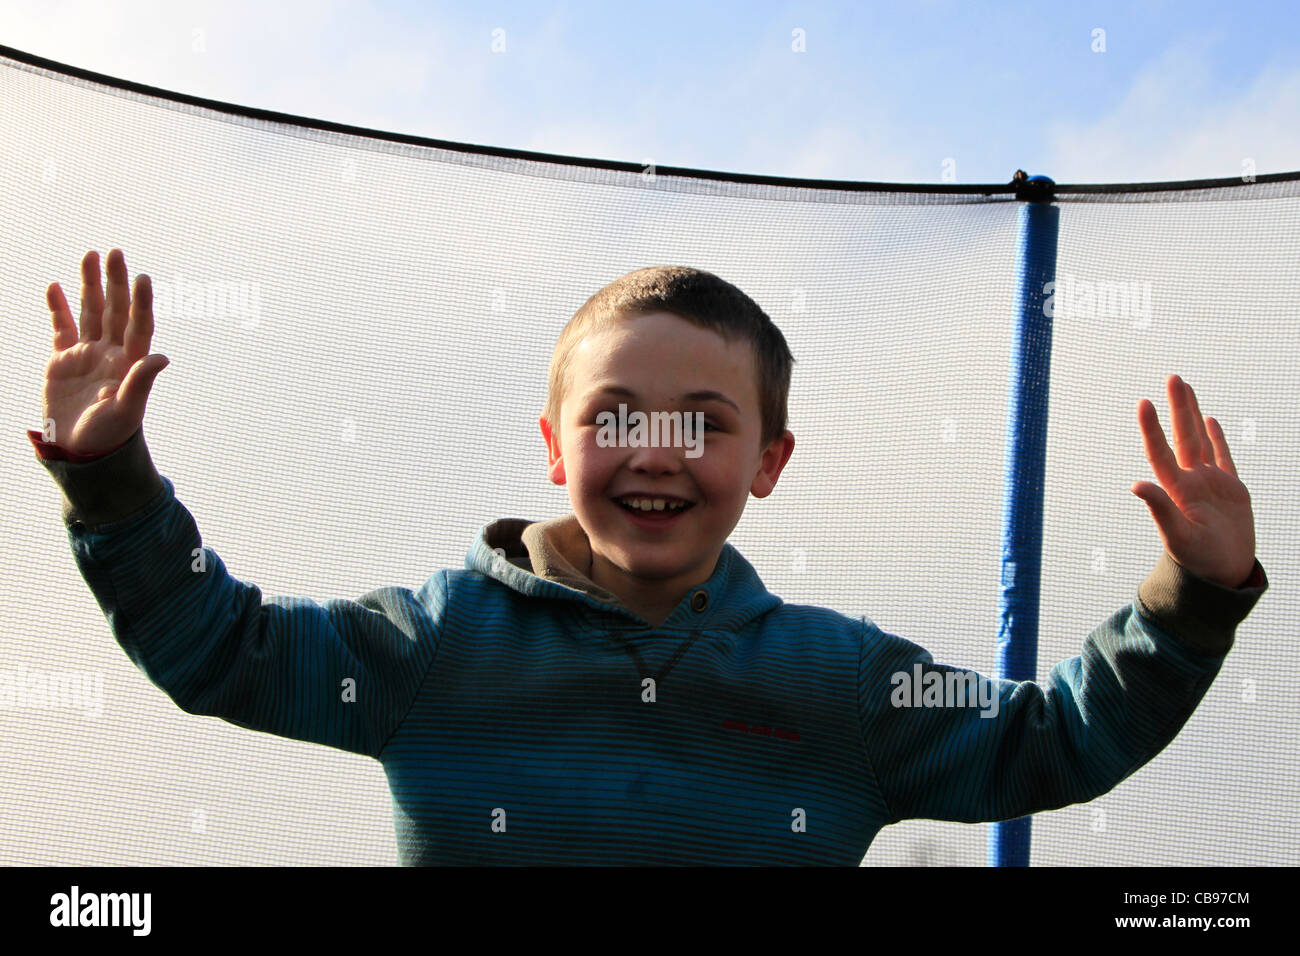 Jeune garçon sur trampoline Photo Stock